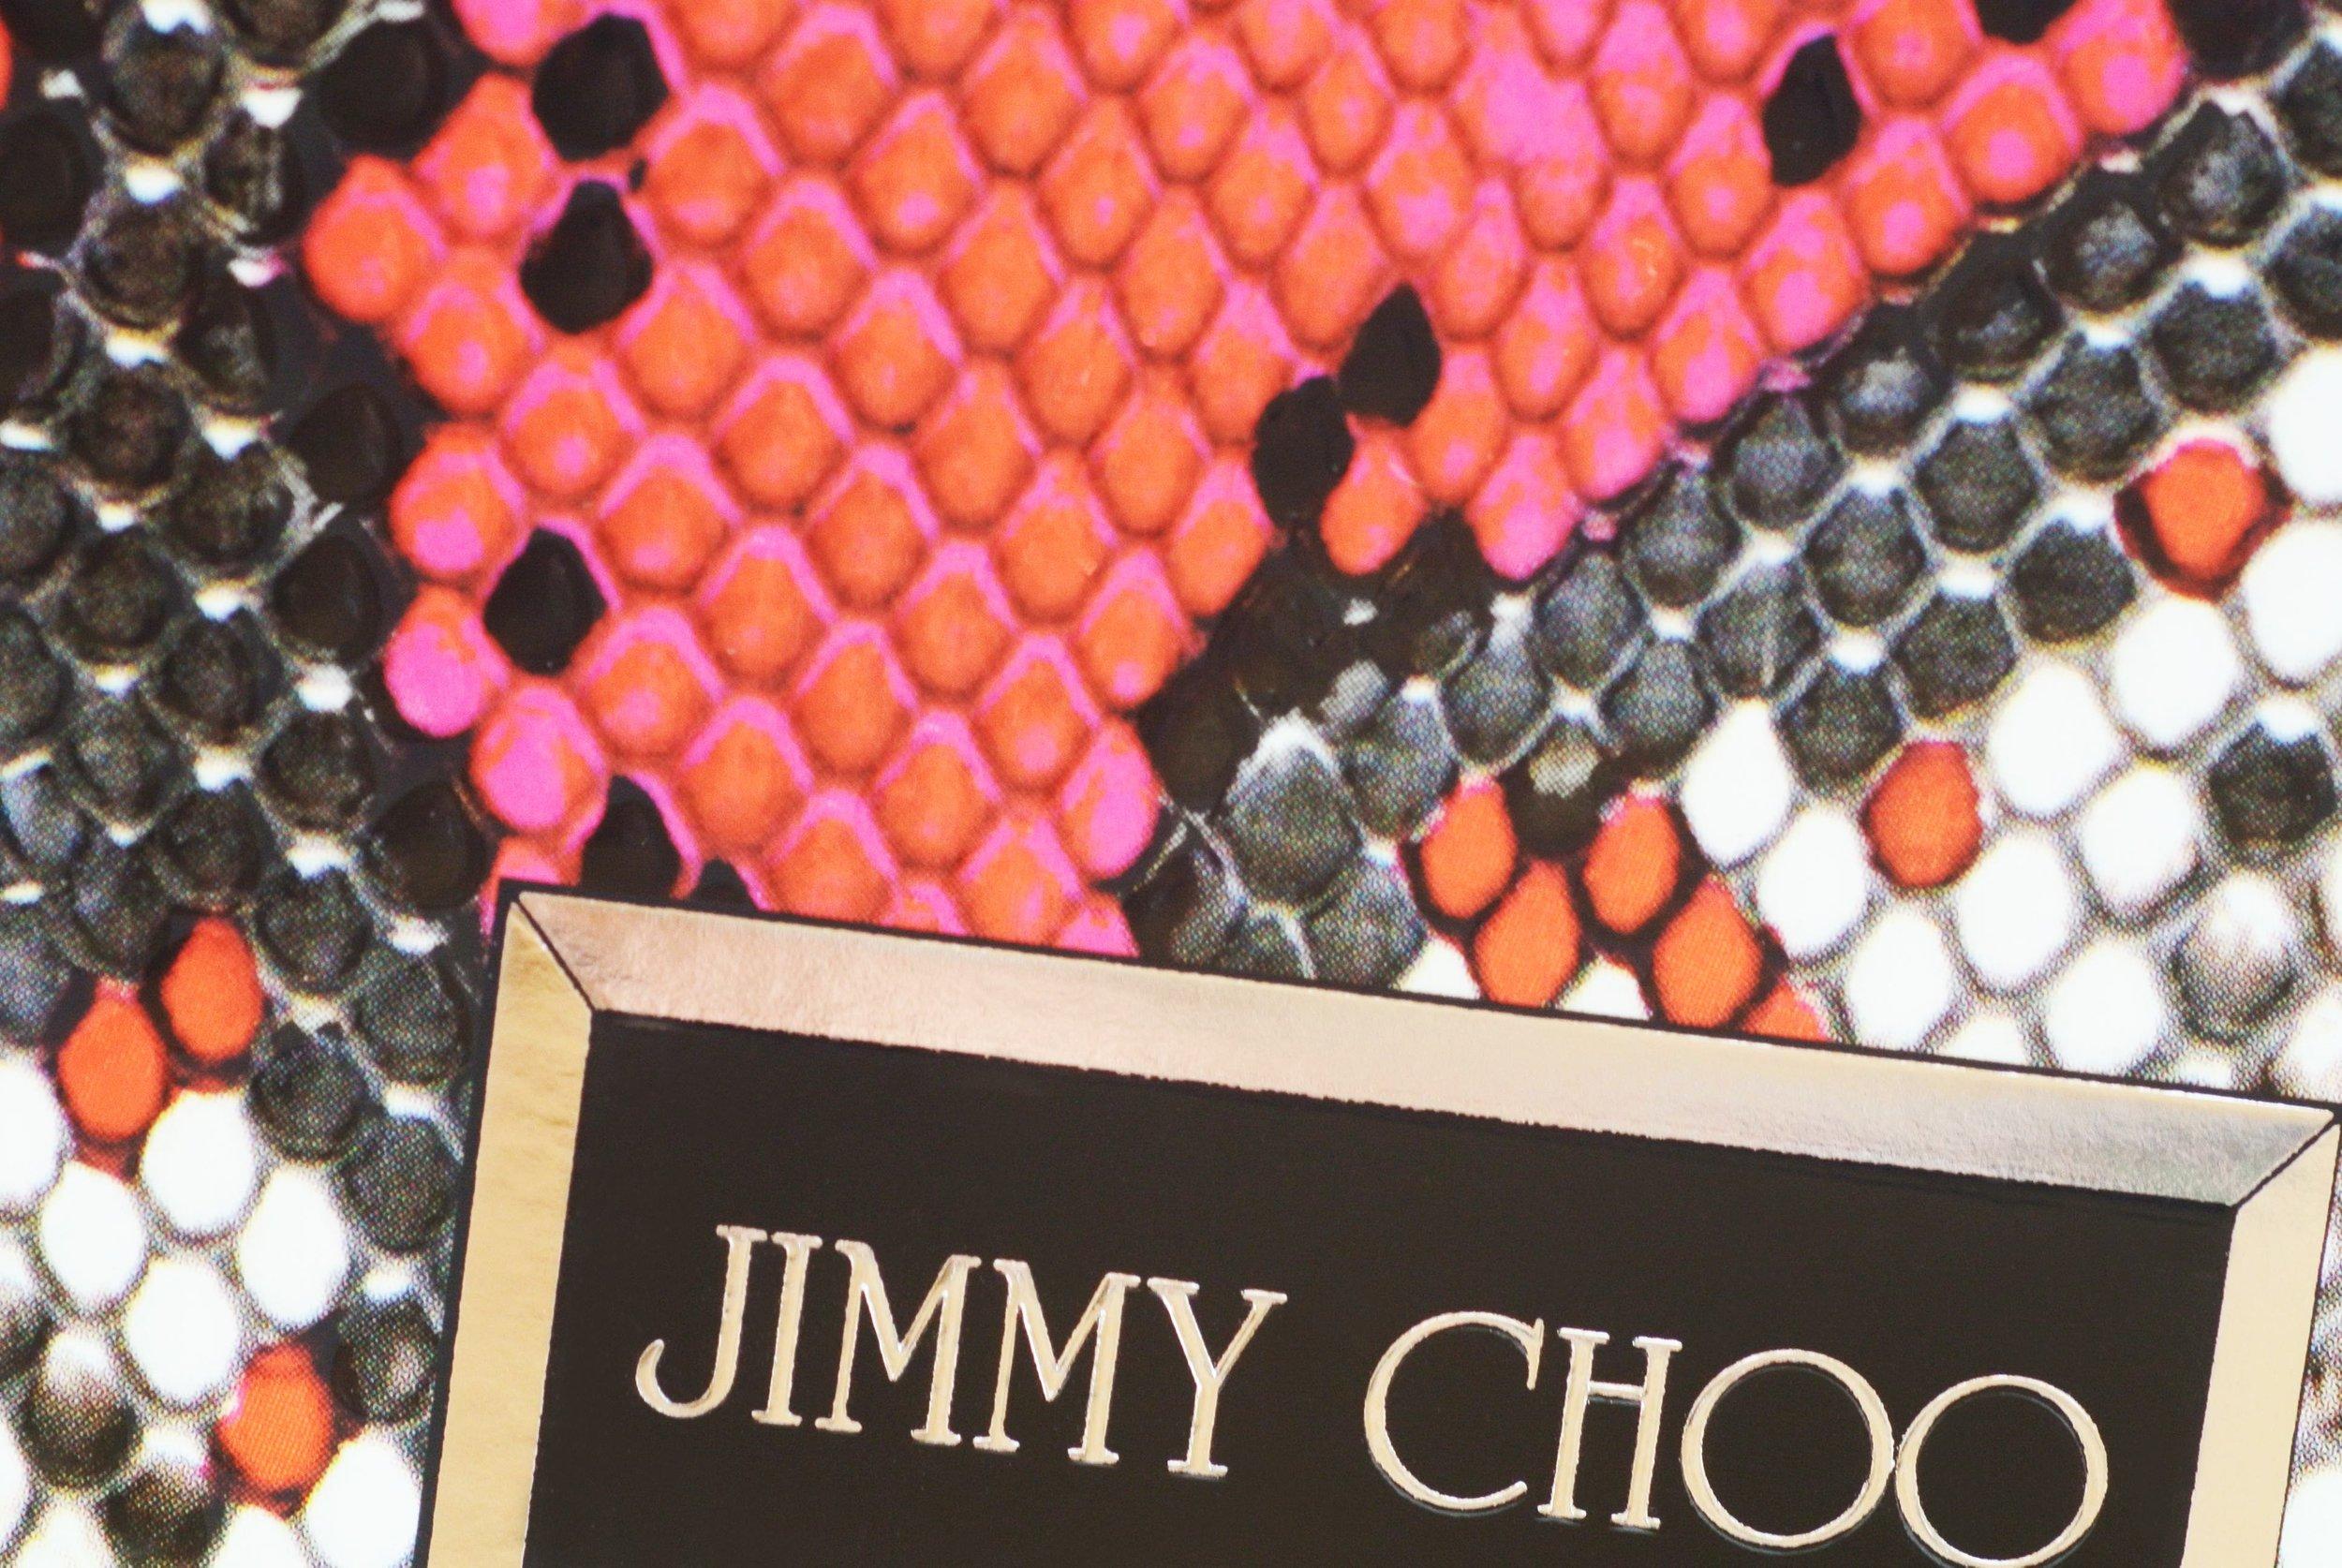 JIMMY CHOO 2.jpg